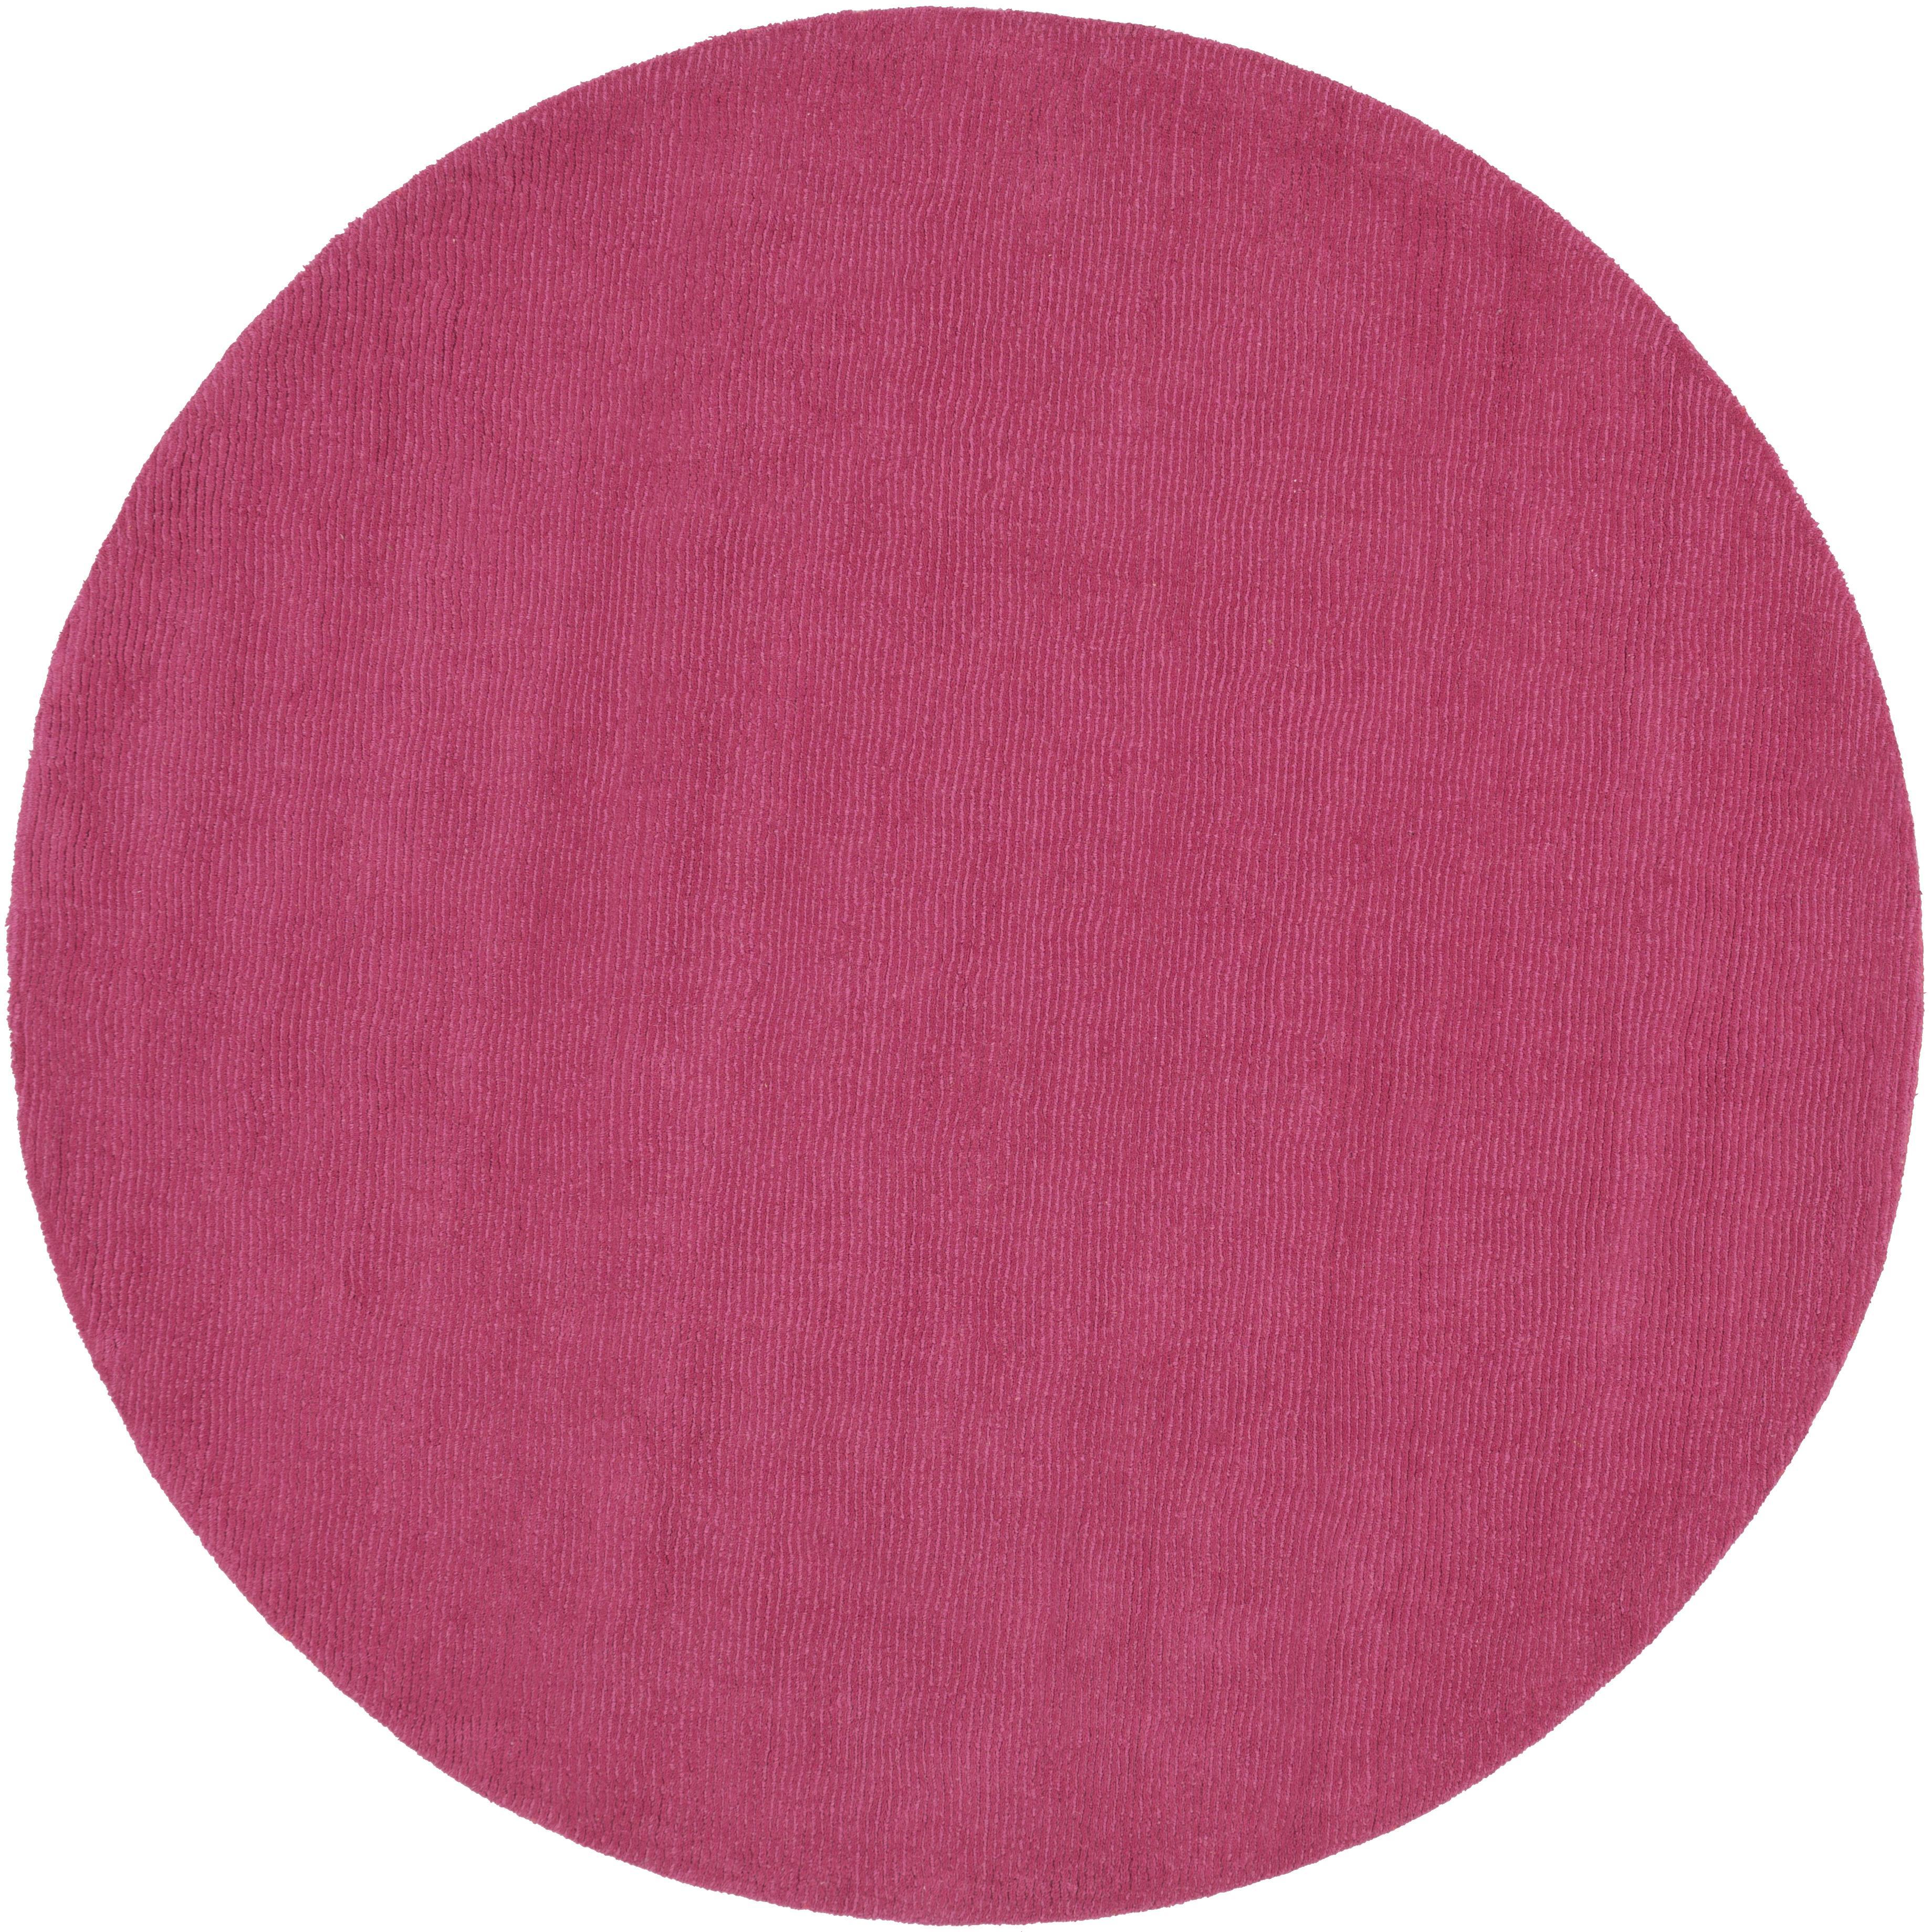 Surya Rugs Mystique 6' Round - Item Number: M5327-6RD